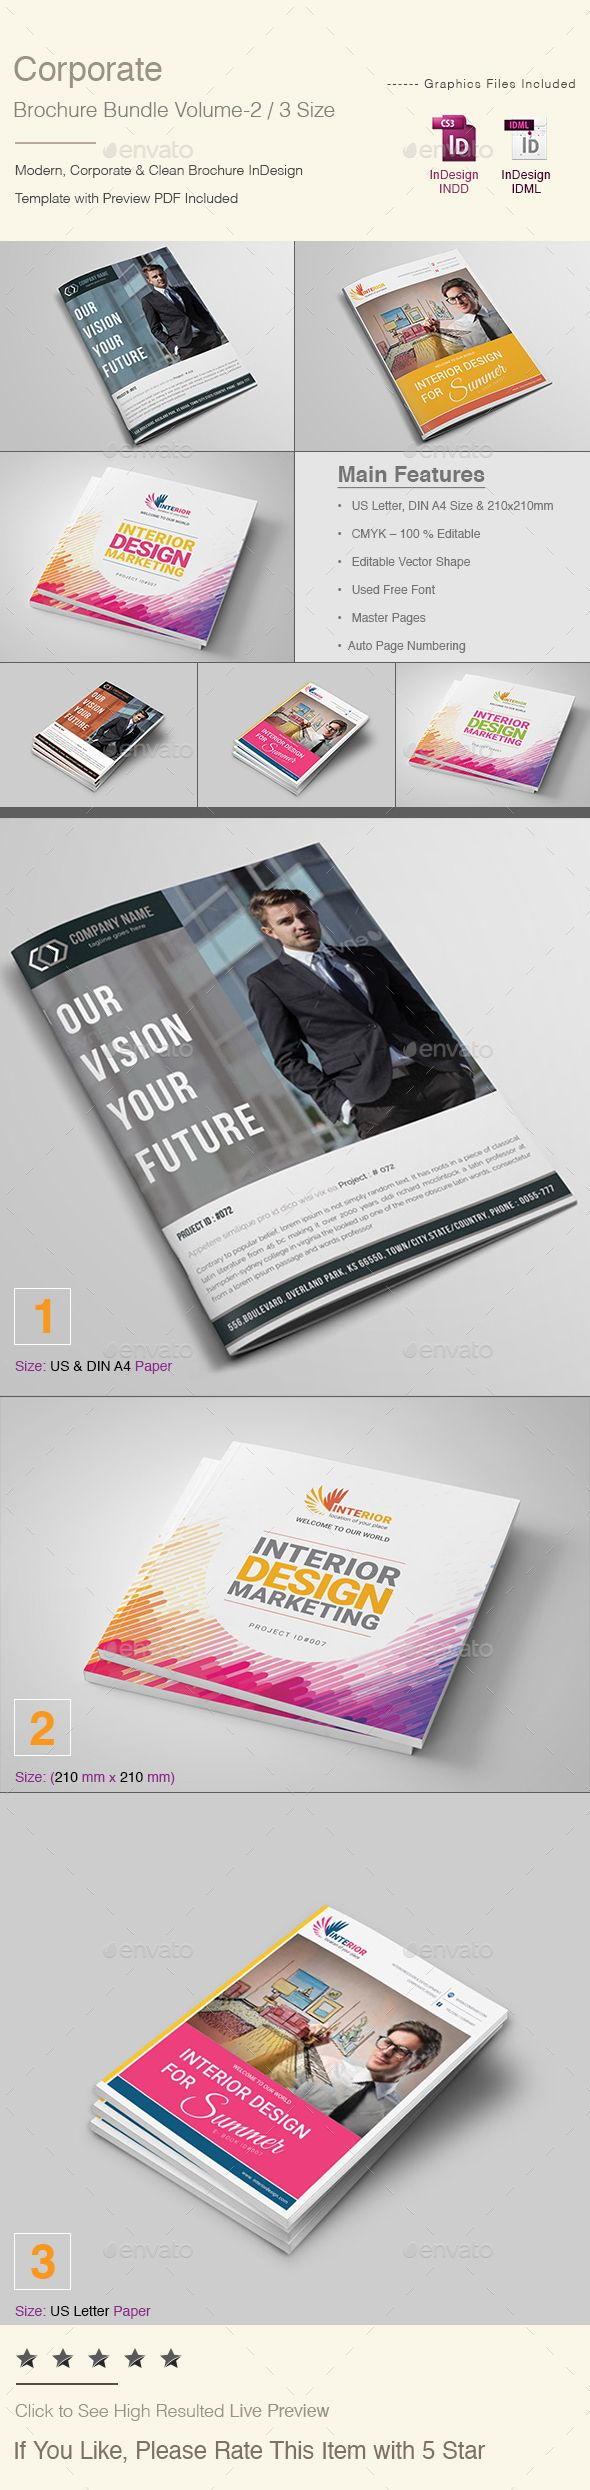 #Corporate #Brochure Bundle | Volume - 2 - Corporate Brochures